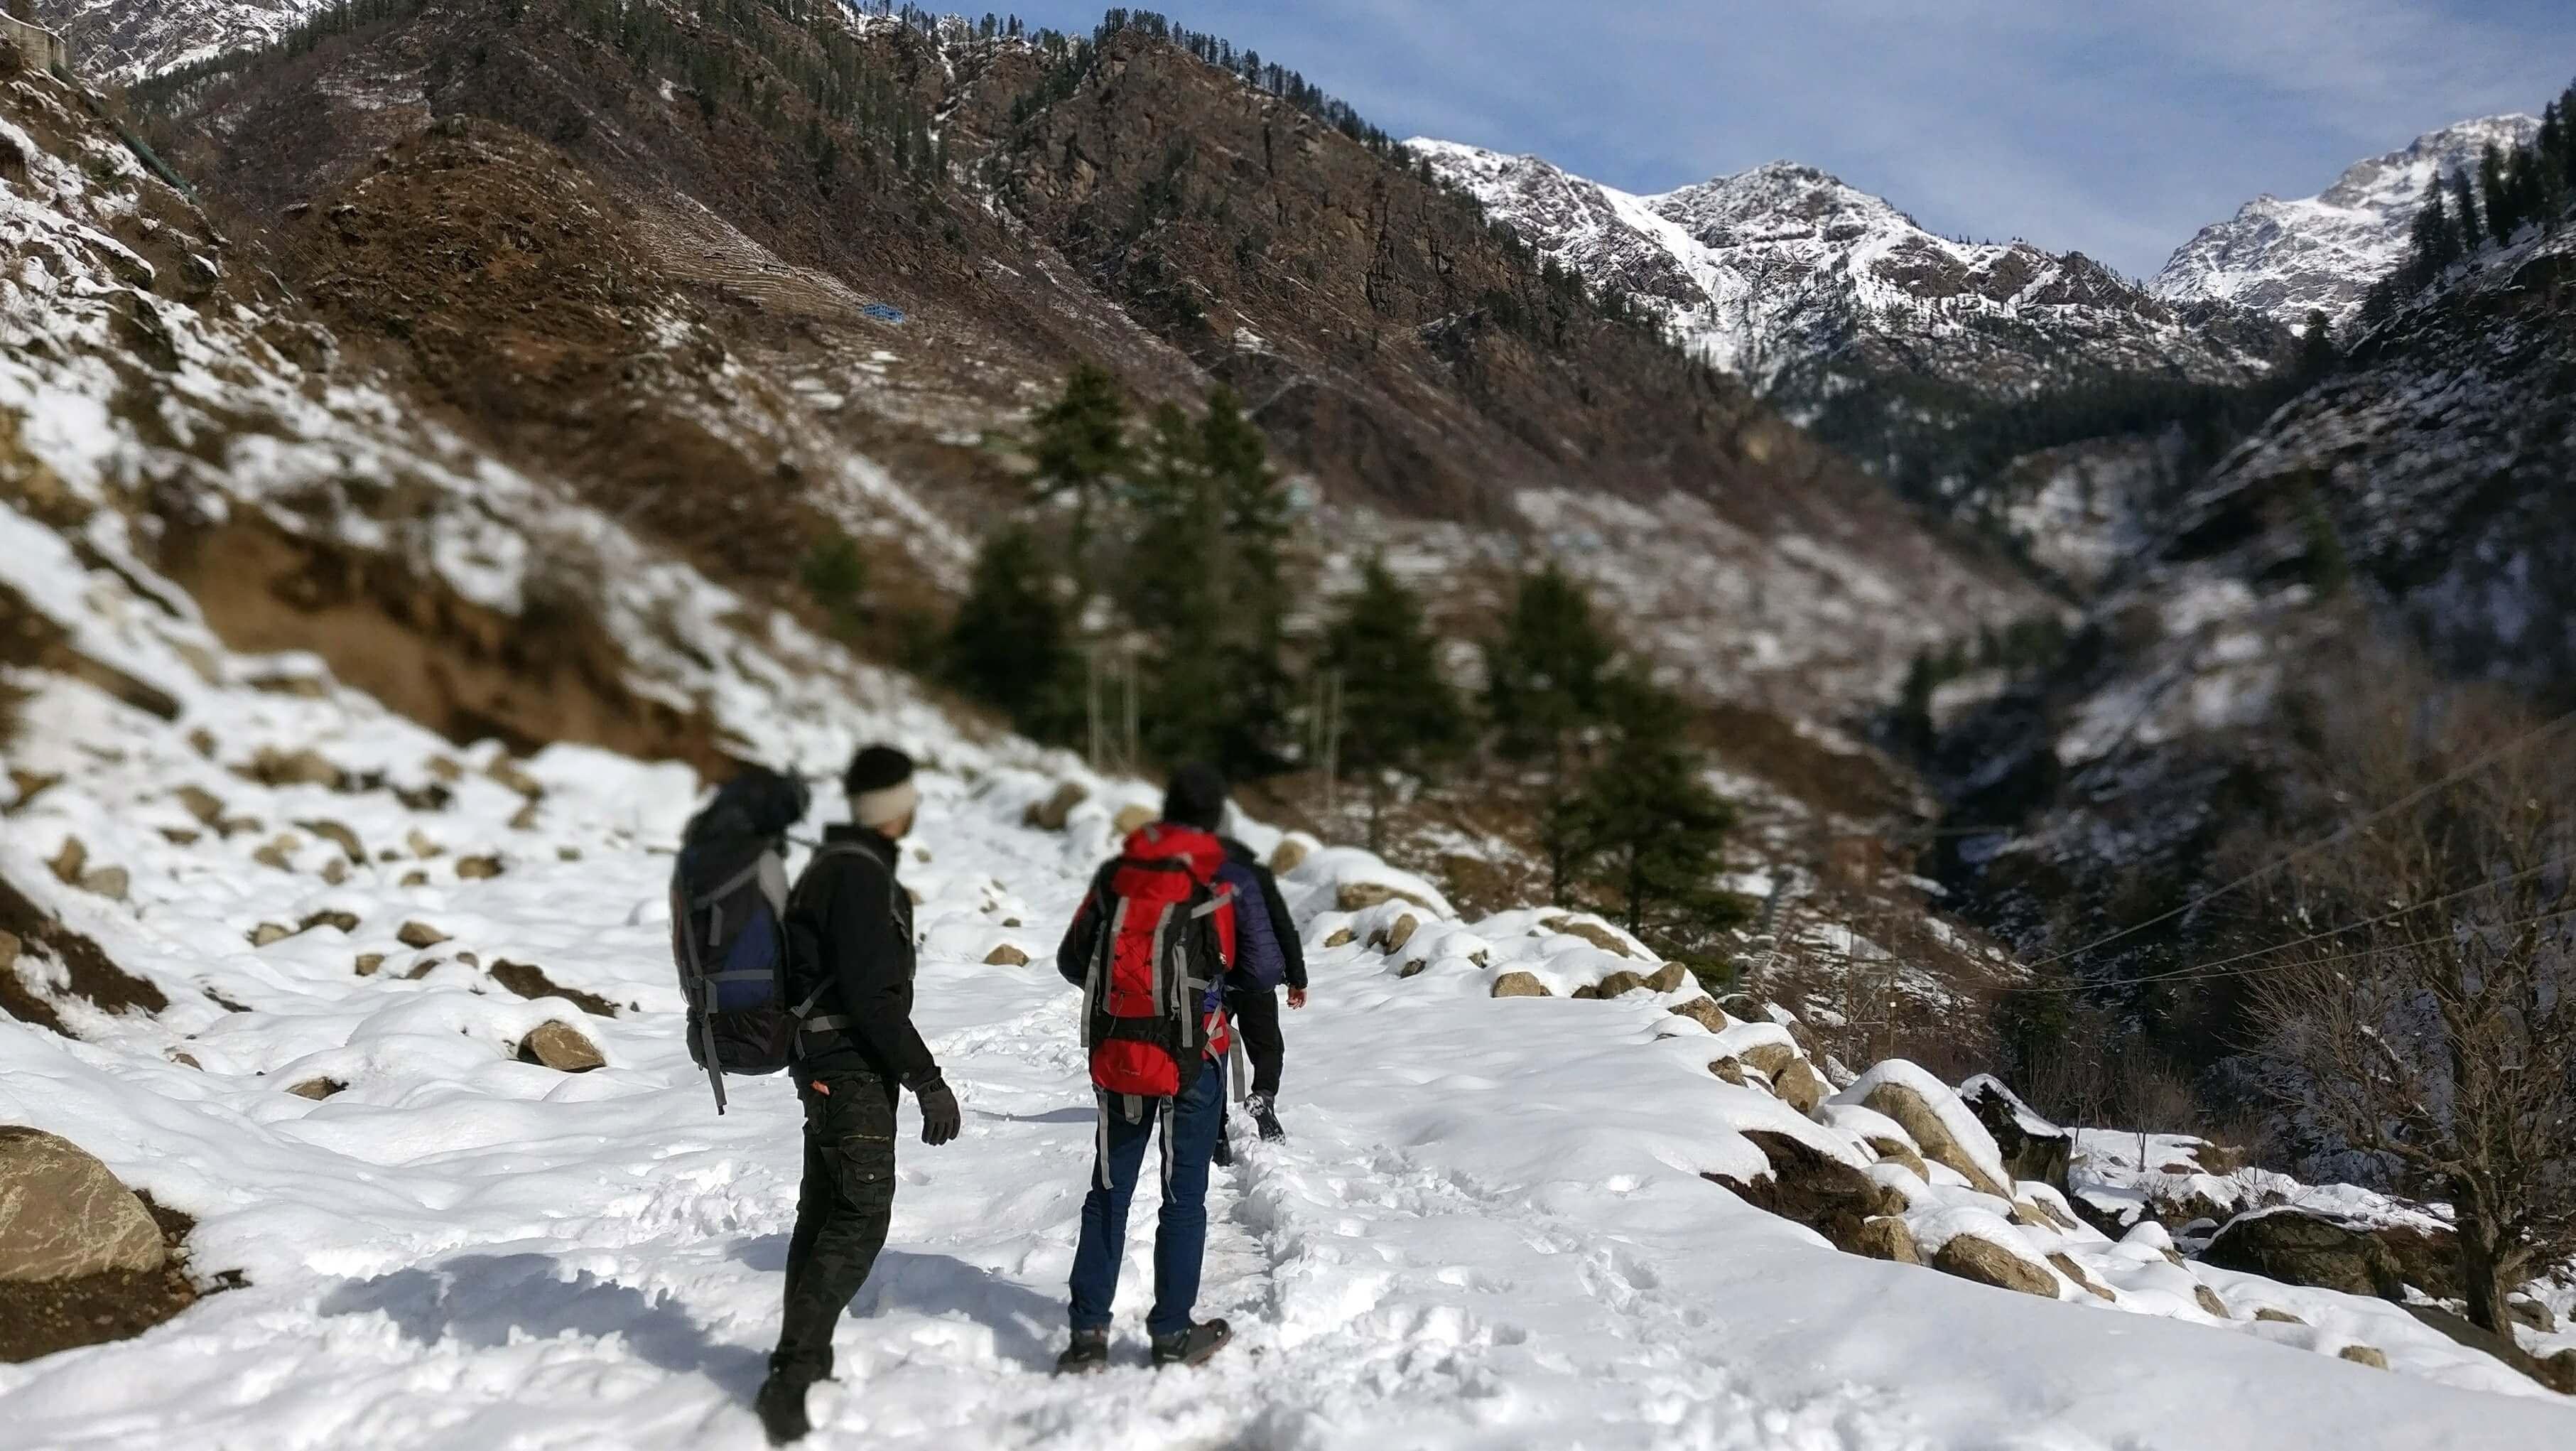 two men walking in snow in mountains